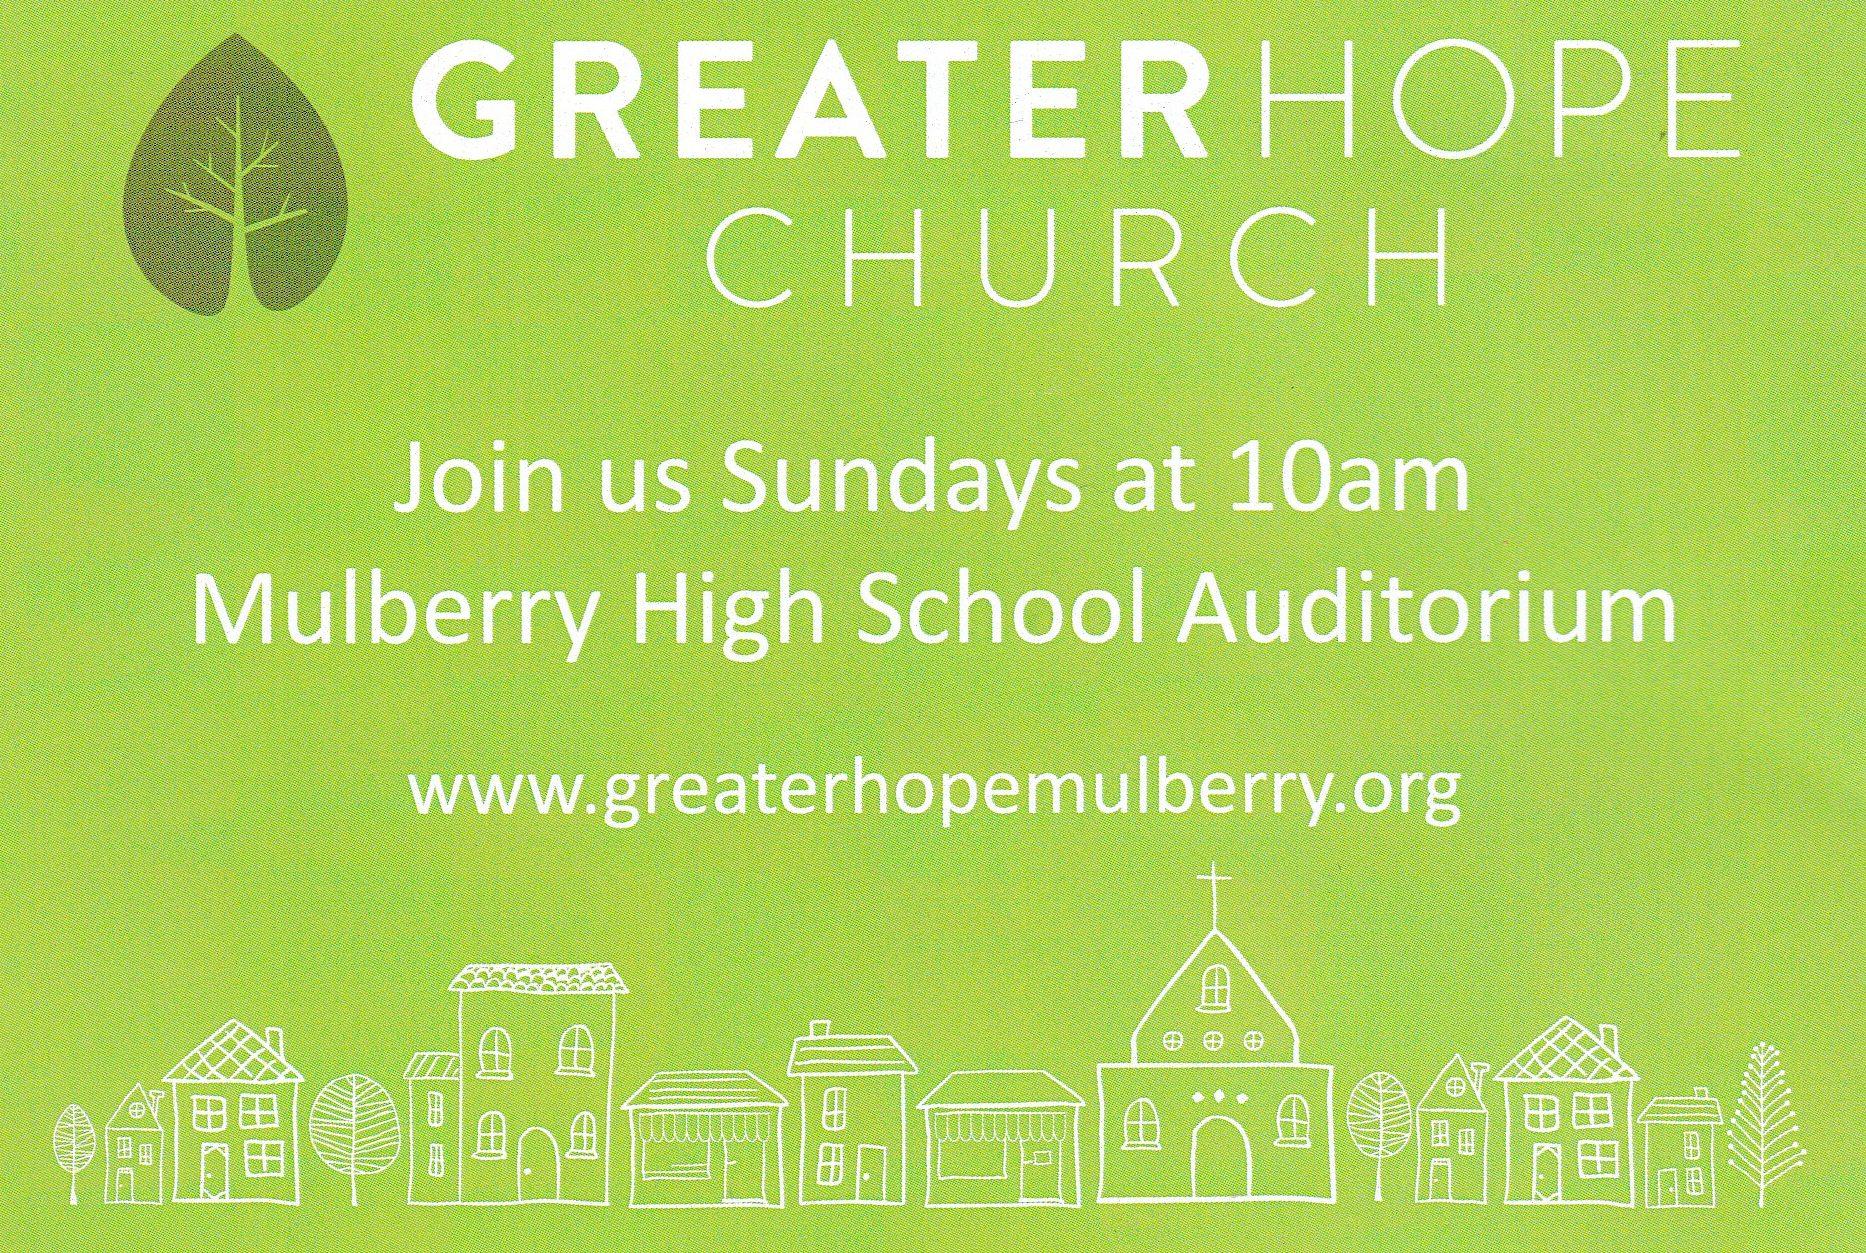 Greater Hope Church